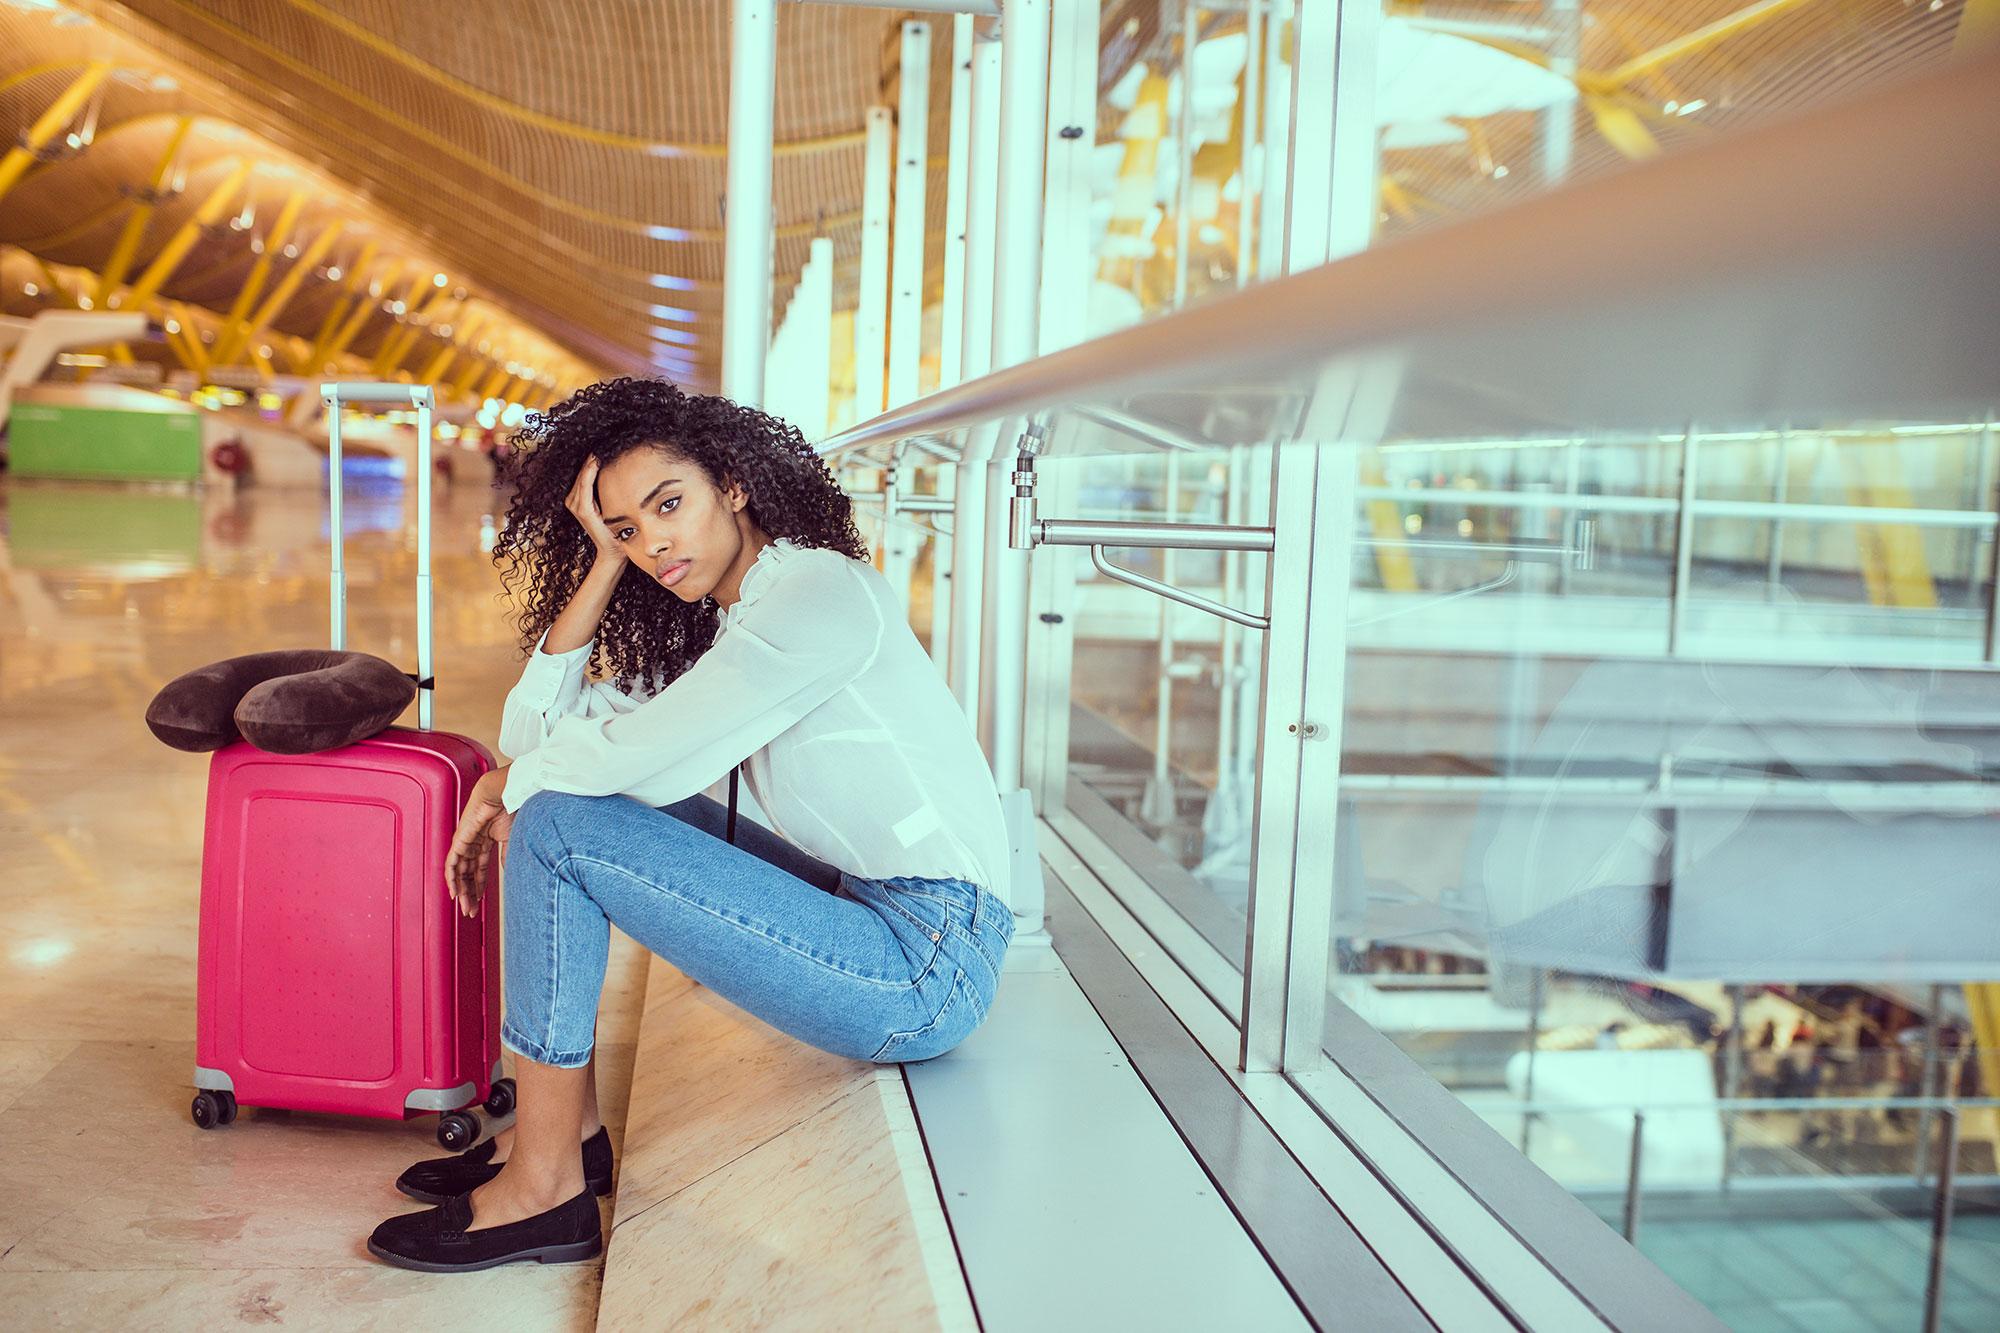 angry woman at airport